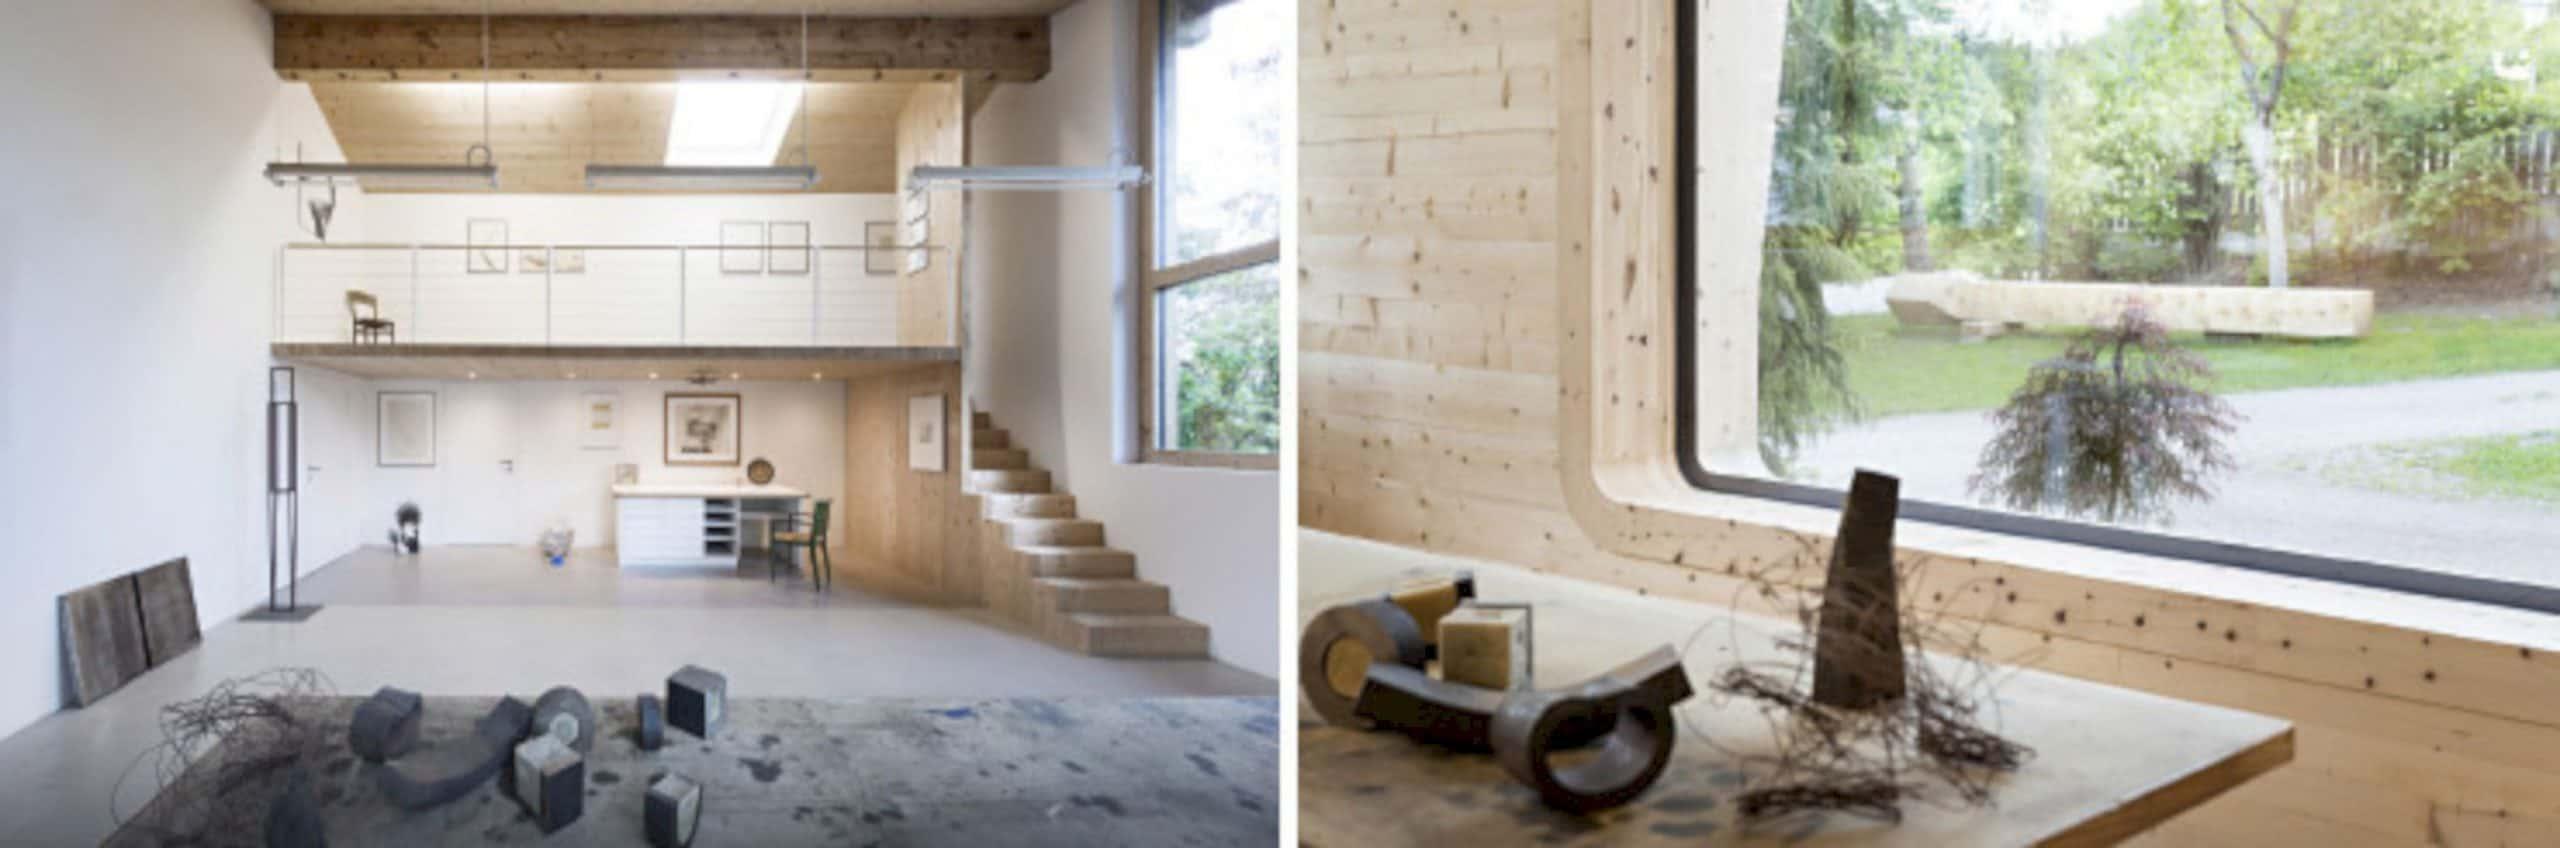 Studio Franz Messner Renovation 2